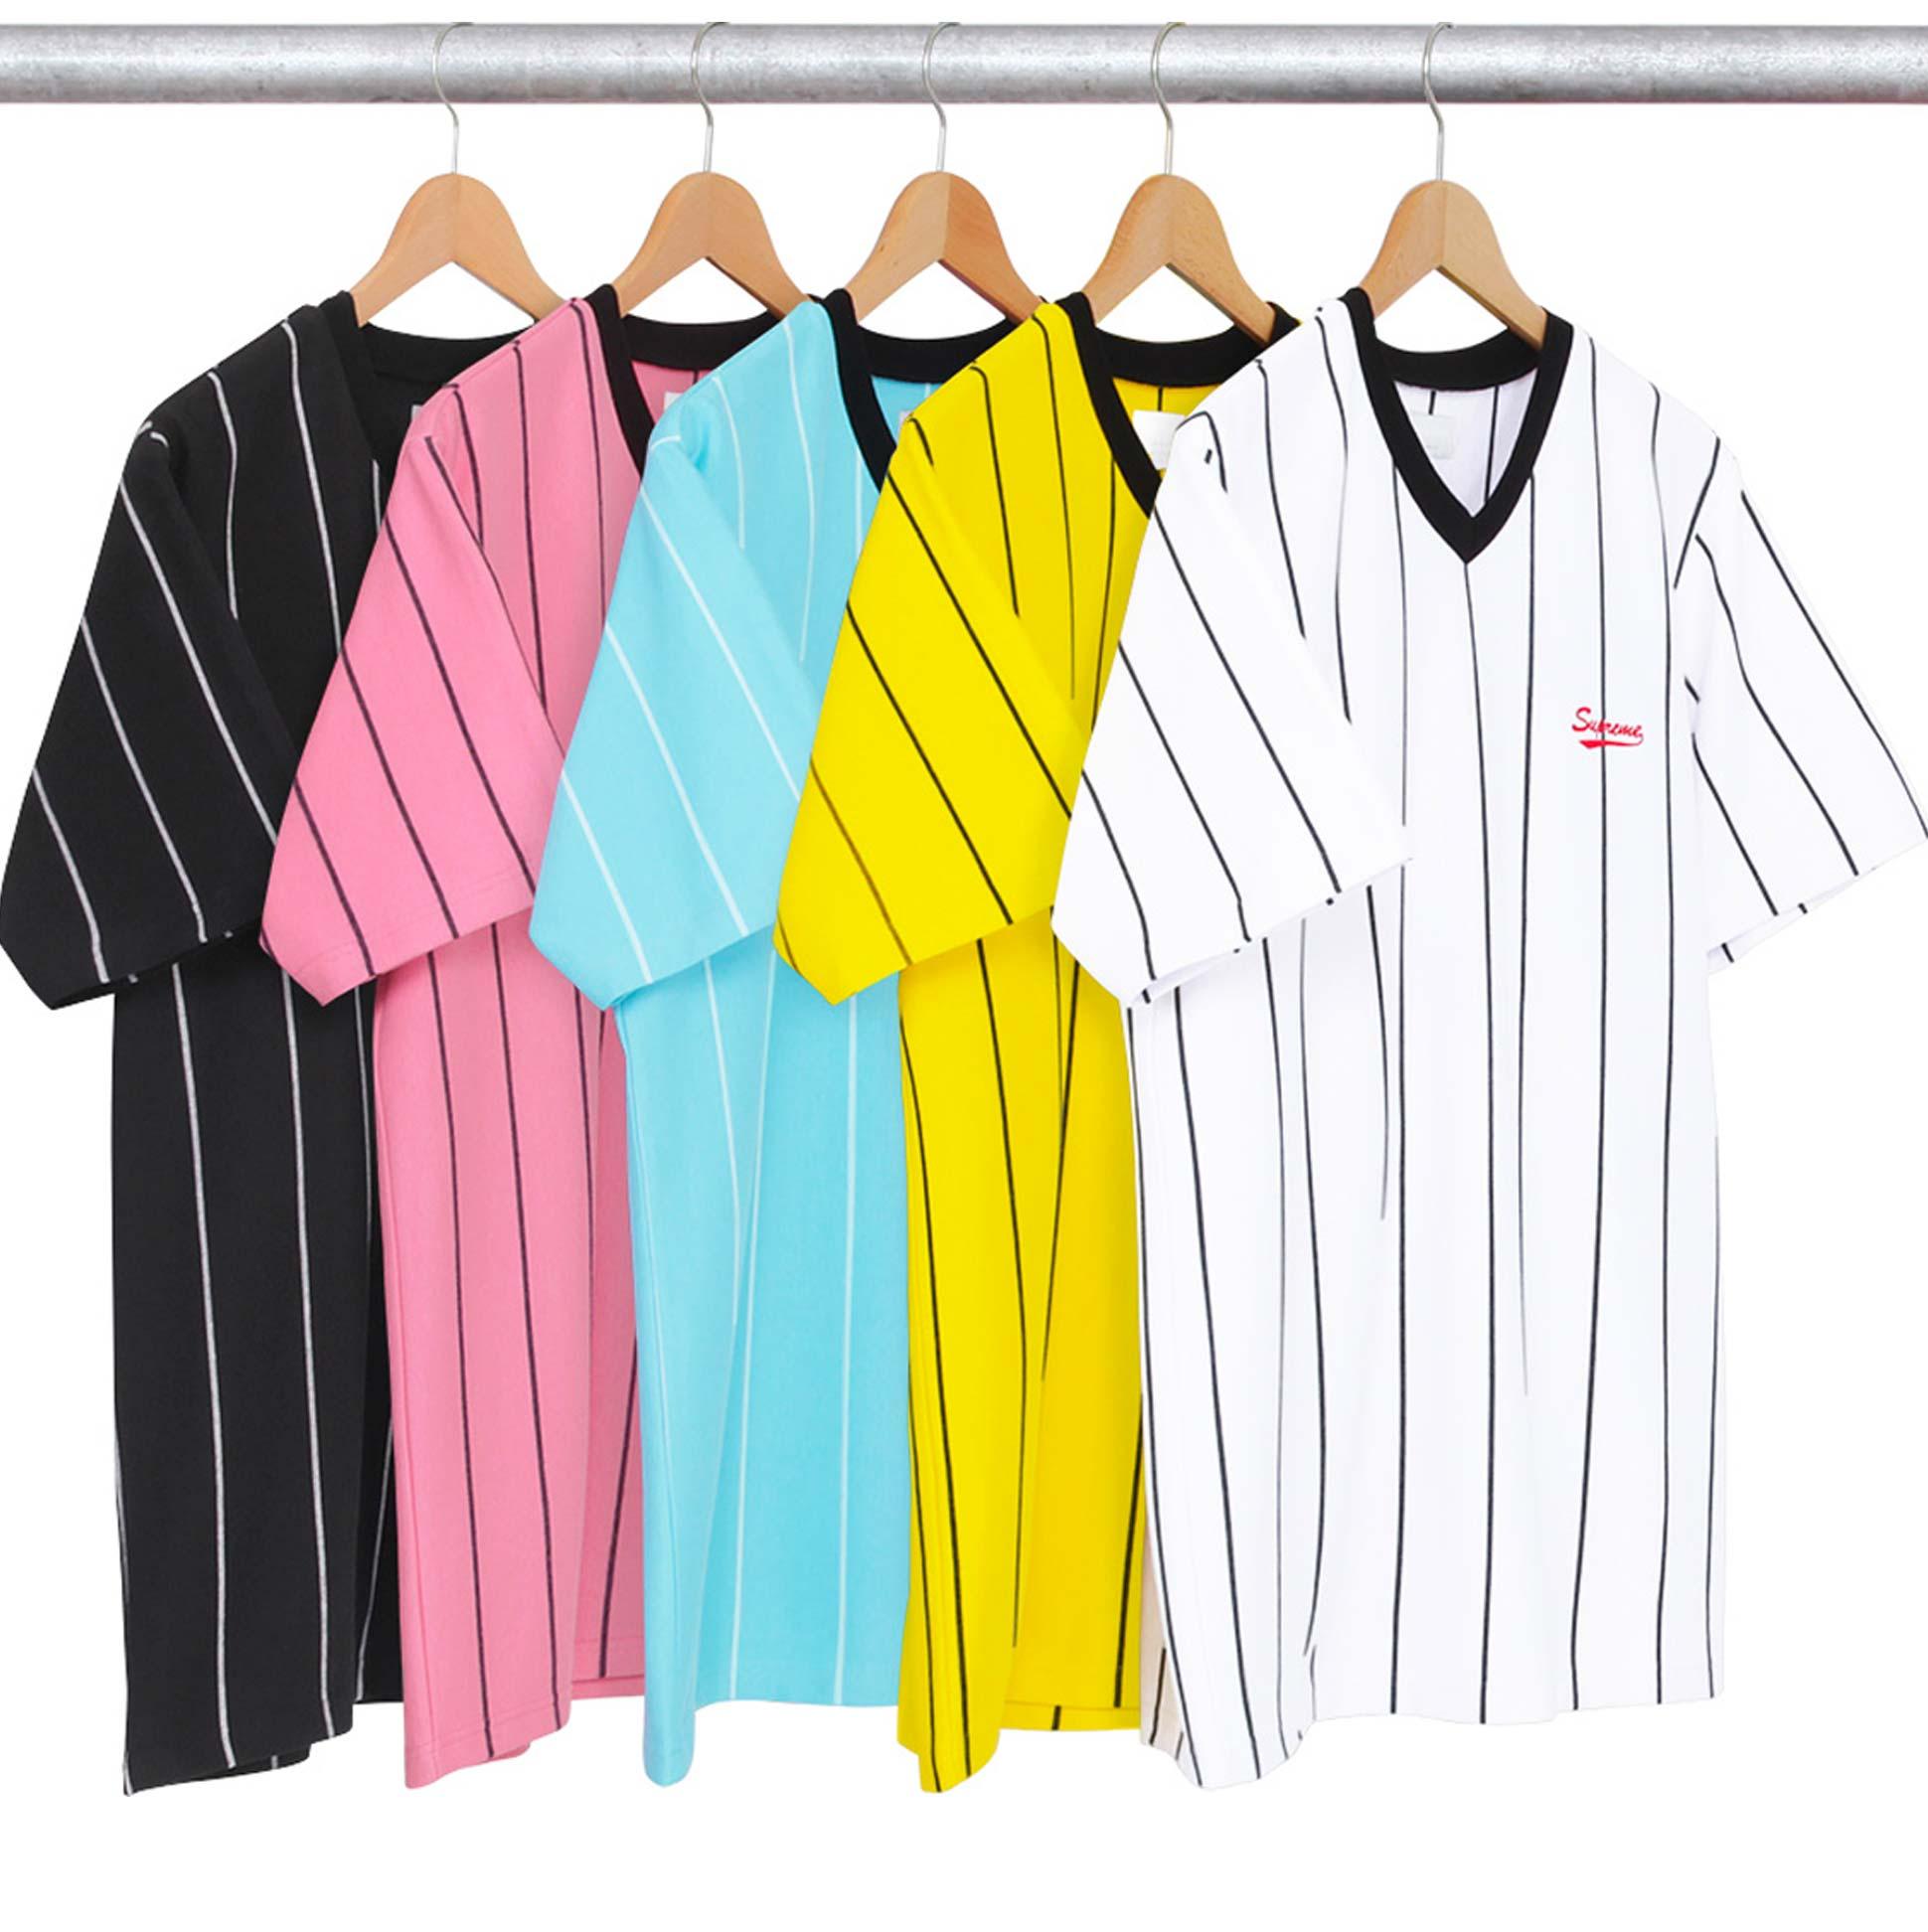 premium selection 864b8 5f469 Supreme SS16 Soccer Jerseys - SoccerBible